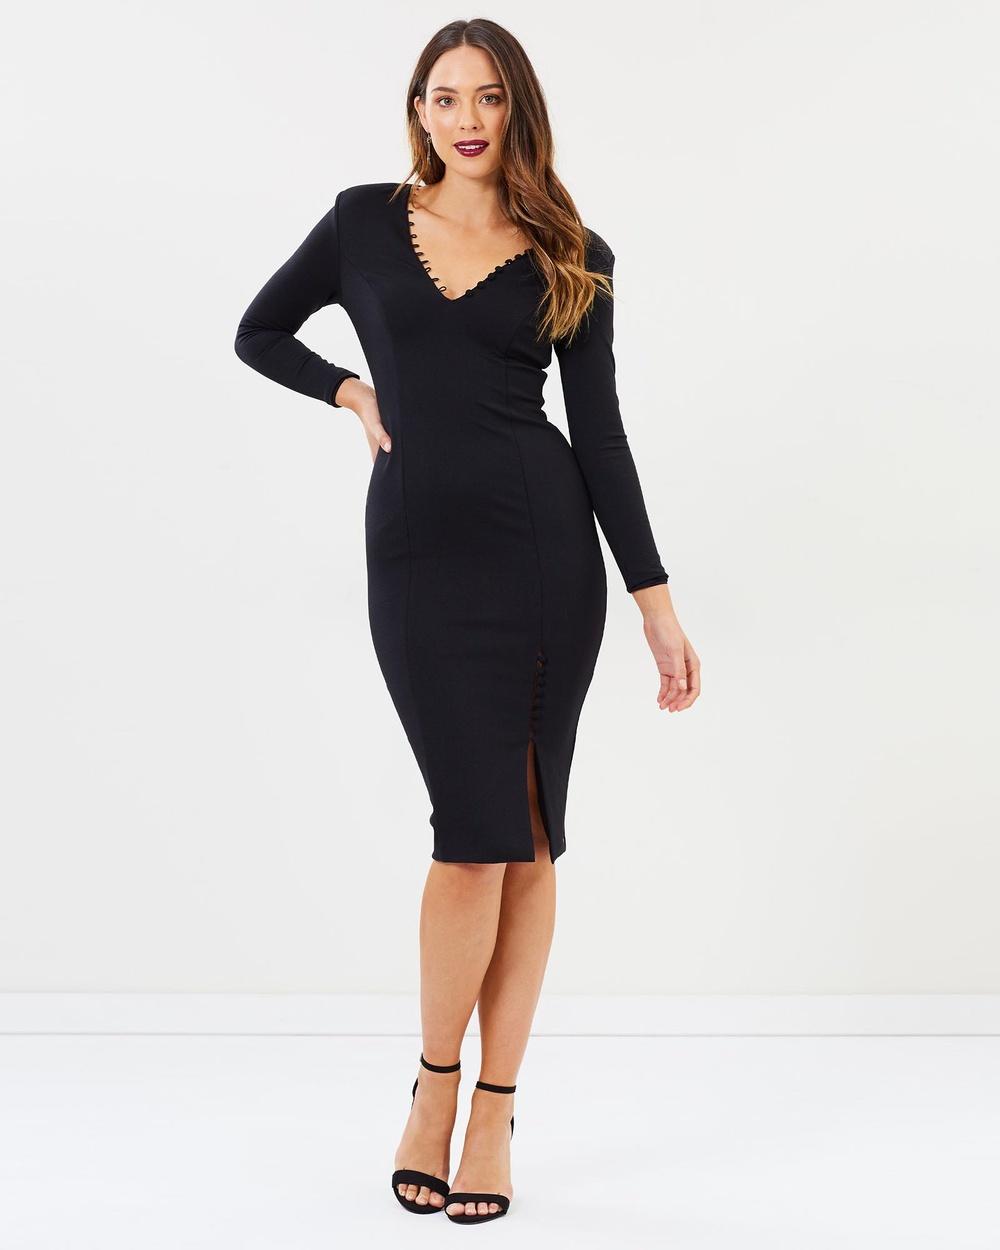 SANTINA-NICOLE Spencer Button Up Dress Bodycon Dresses Black Spencer Button Up Dress